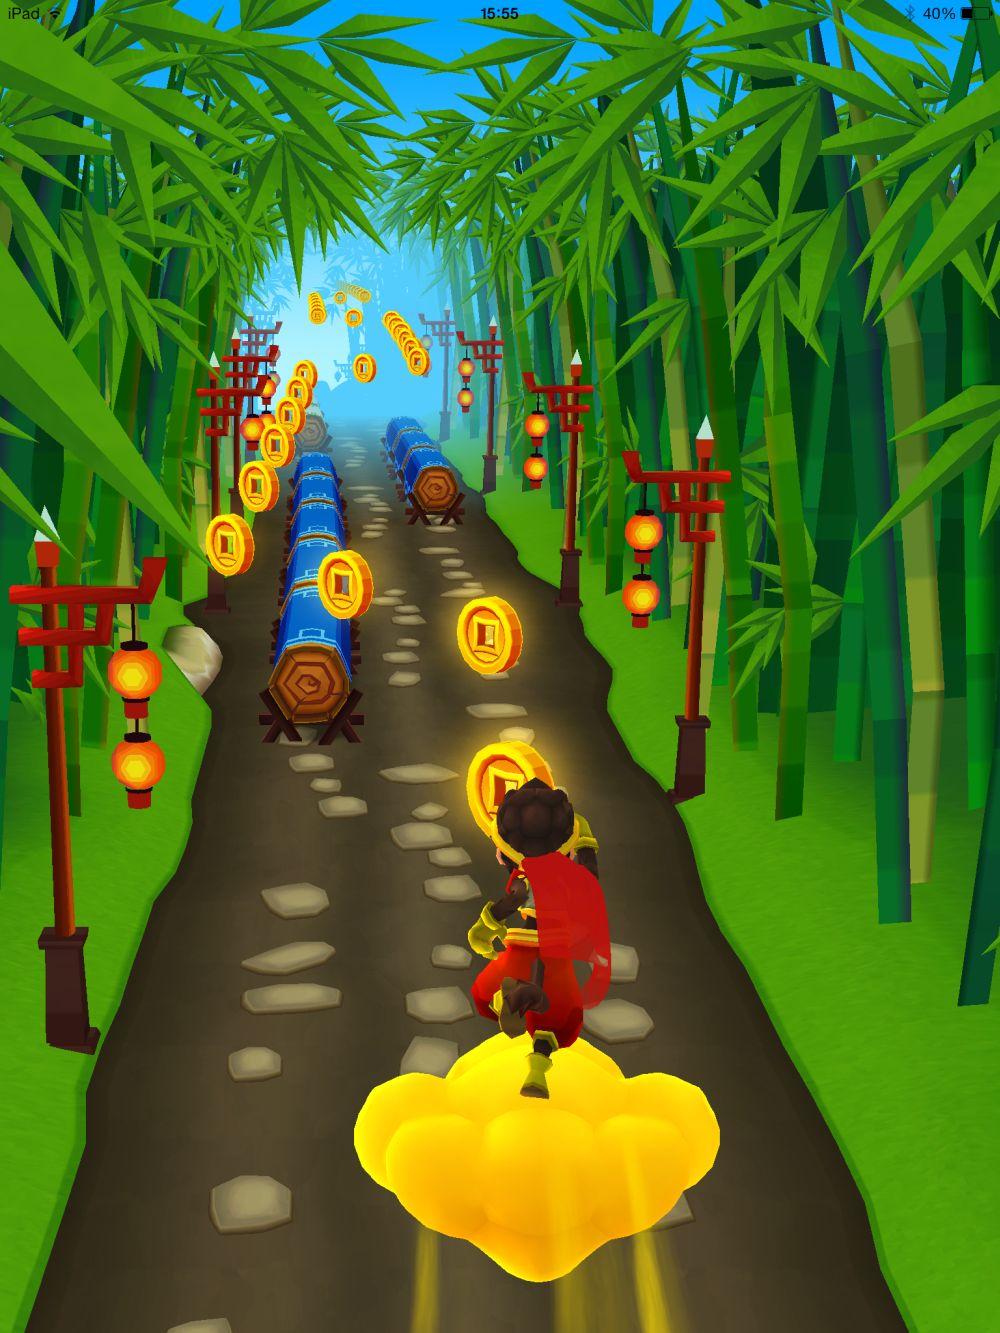 monkey-king-escape-screen-shot-02